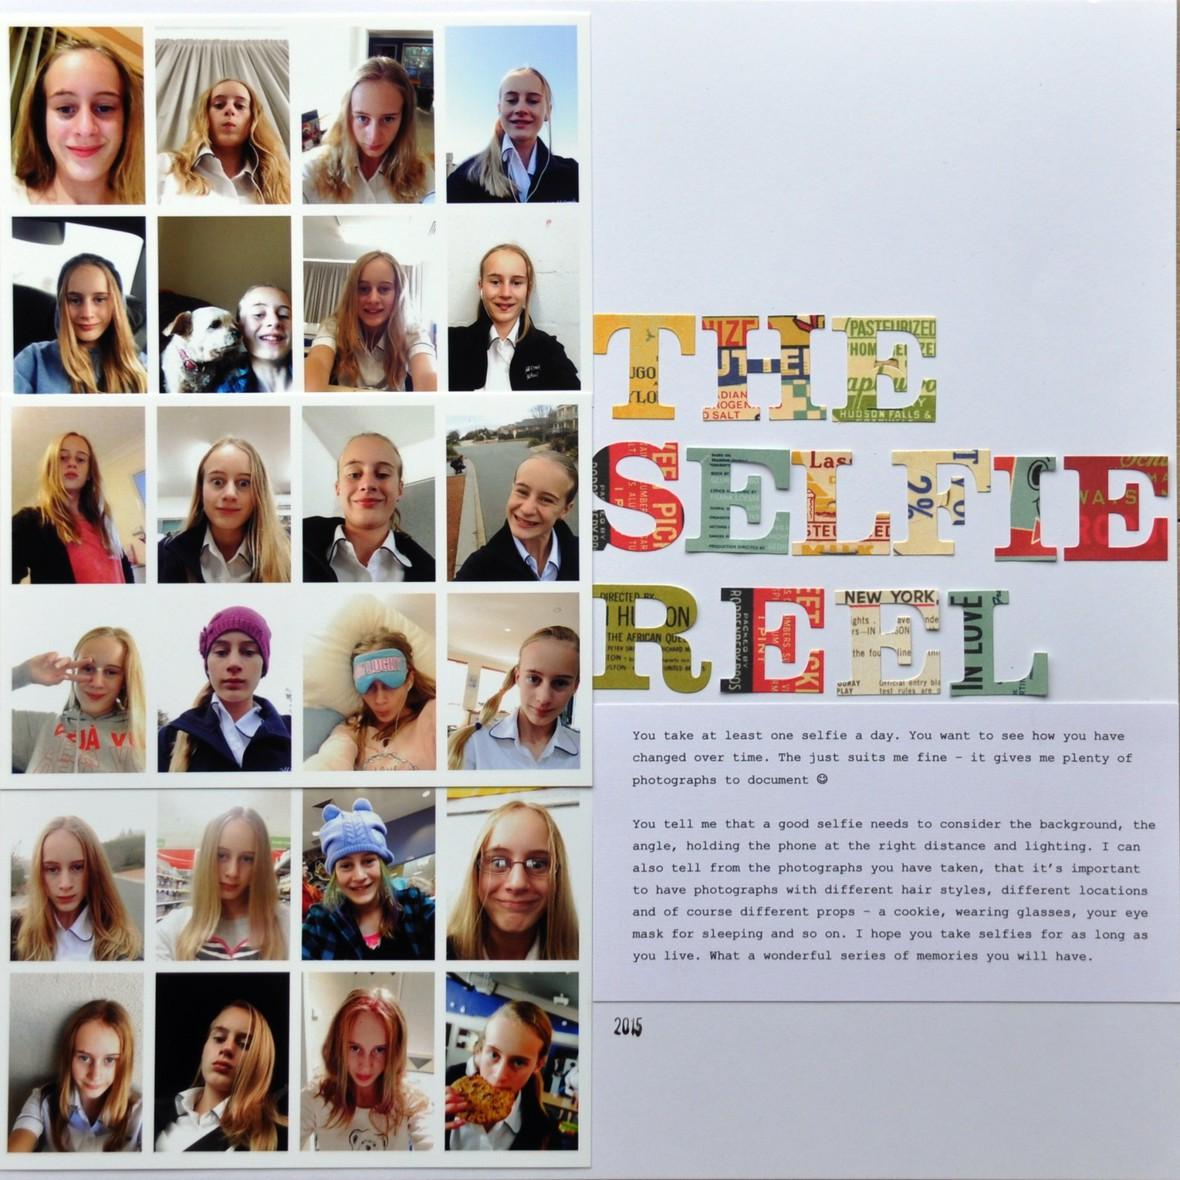 The selfie reel smaller original